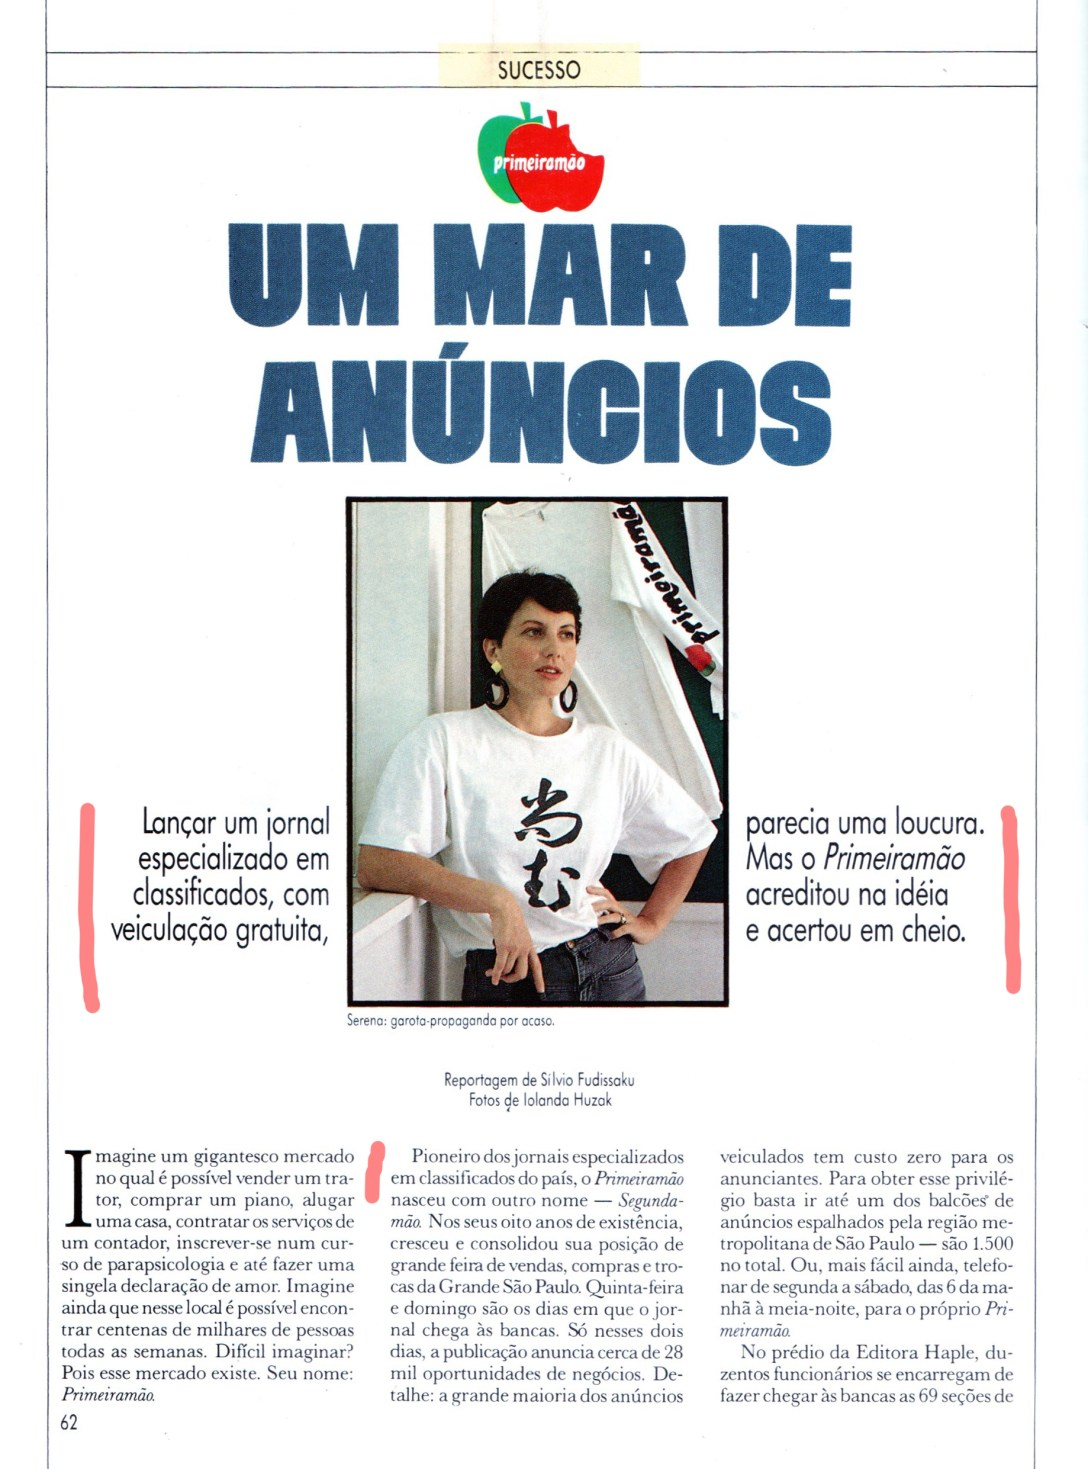 1989-02 Jornal Pequenas empresas grandes negocios 2